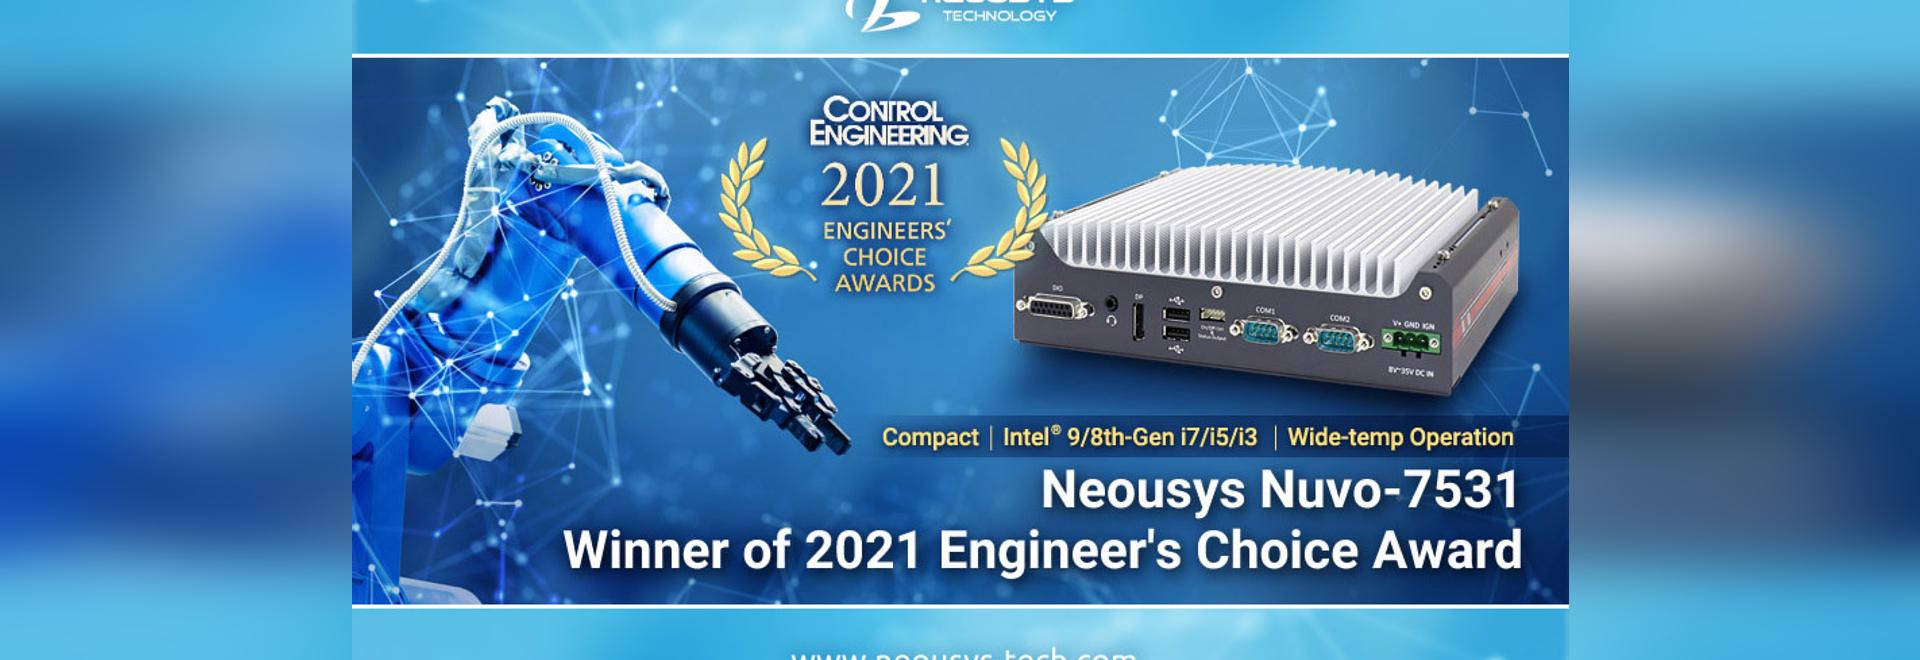 Neousys Nuvo-7531 Wins Control Engineering Engineers' Choice Award